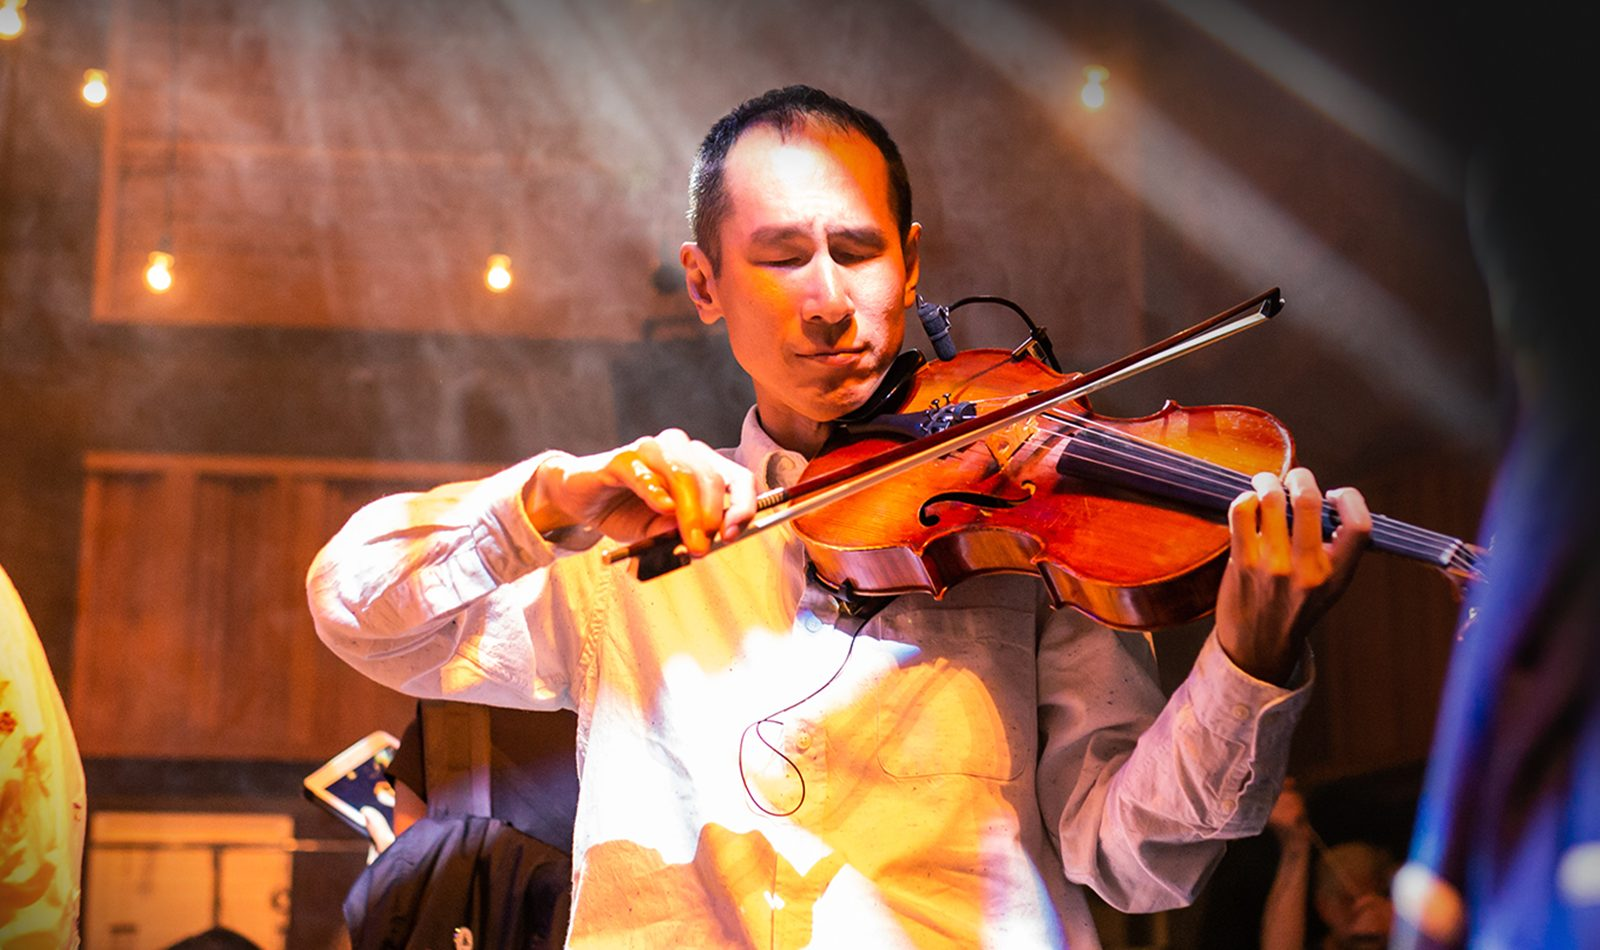 A man plays violin, warm atmospheric lighting